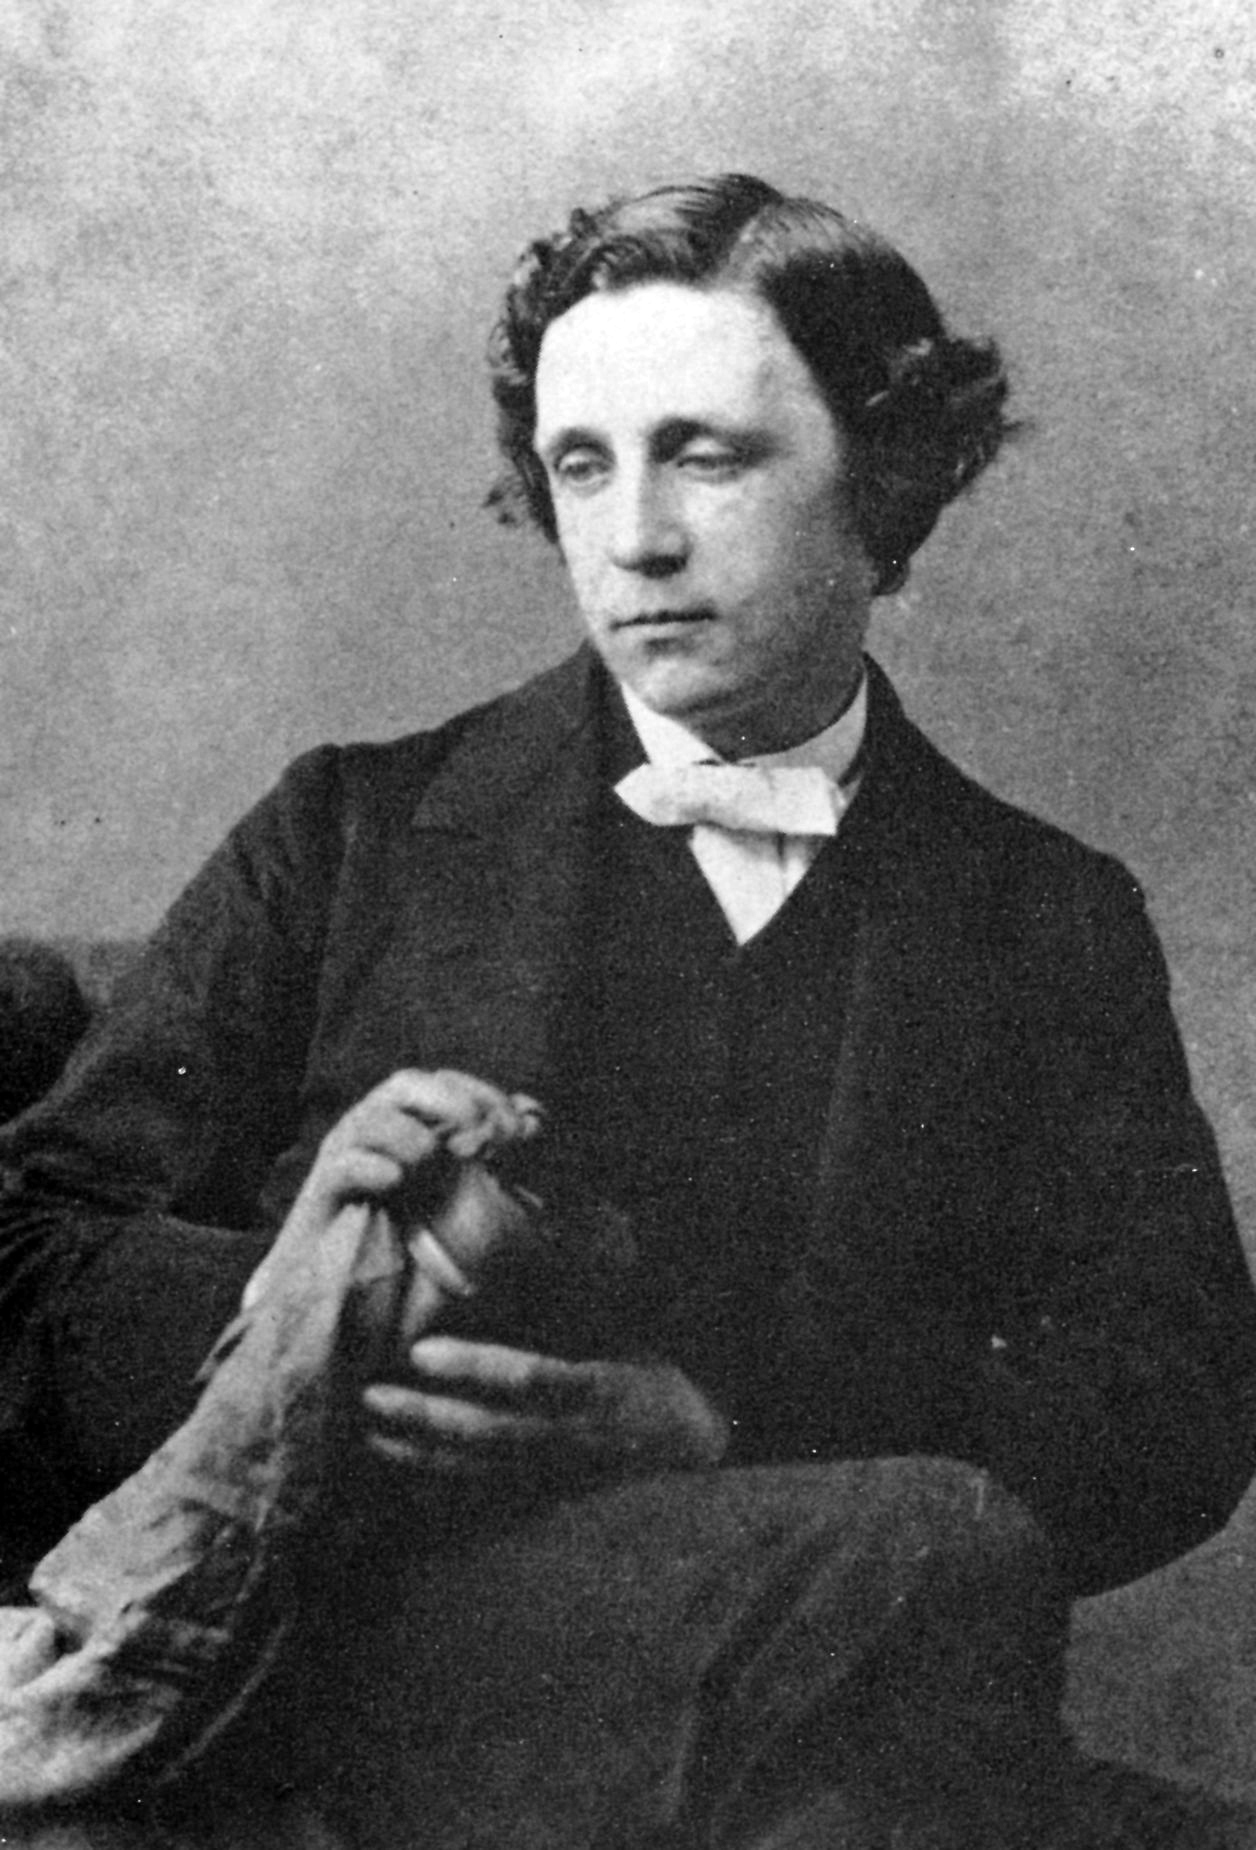 Lewis Carroll - Fotografie 1863